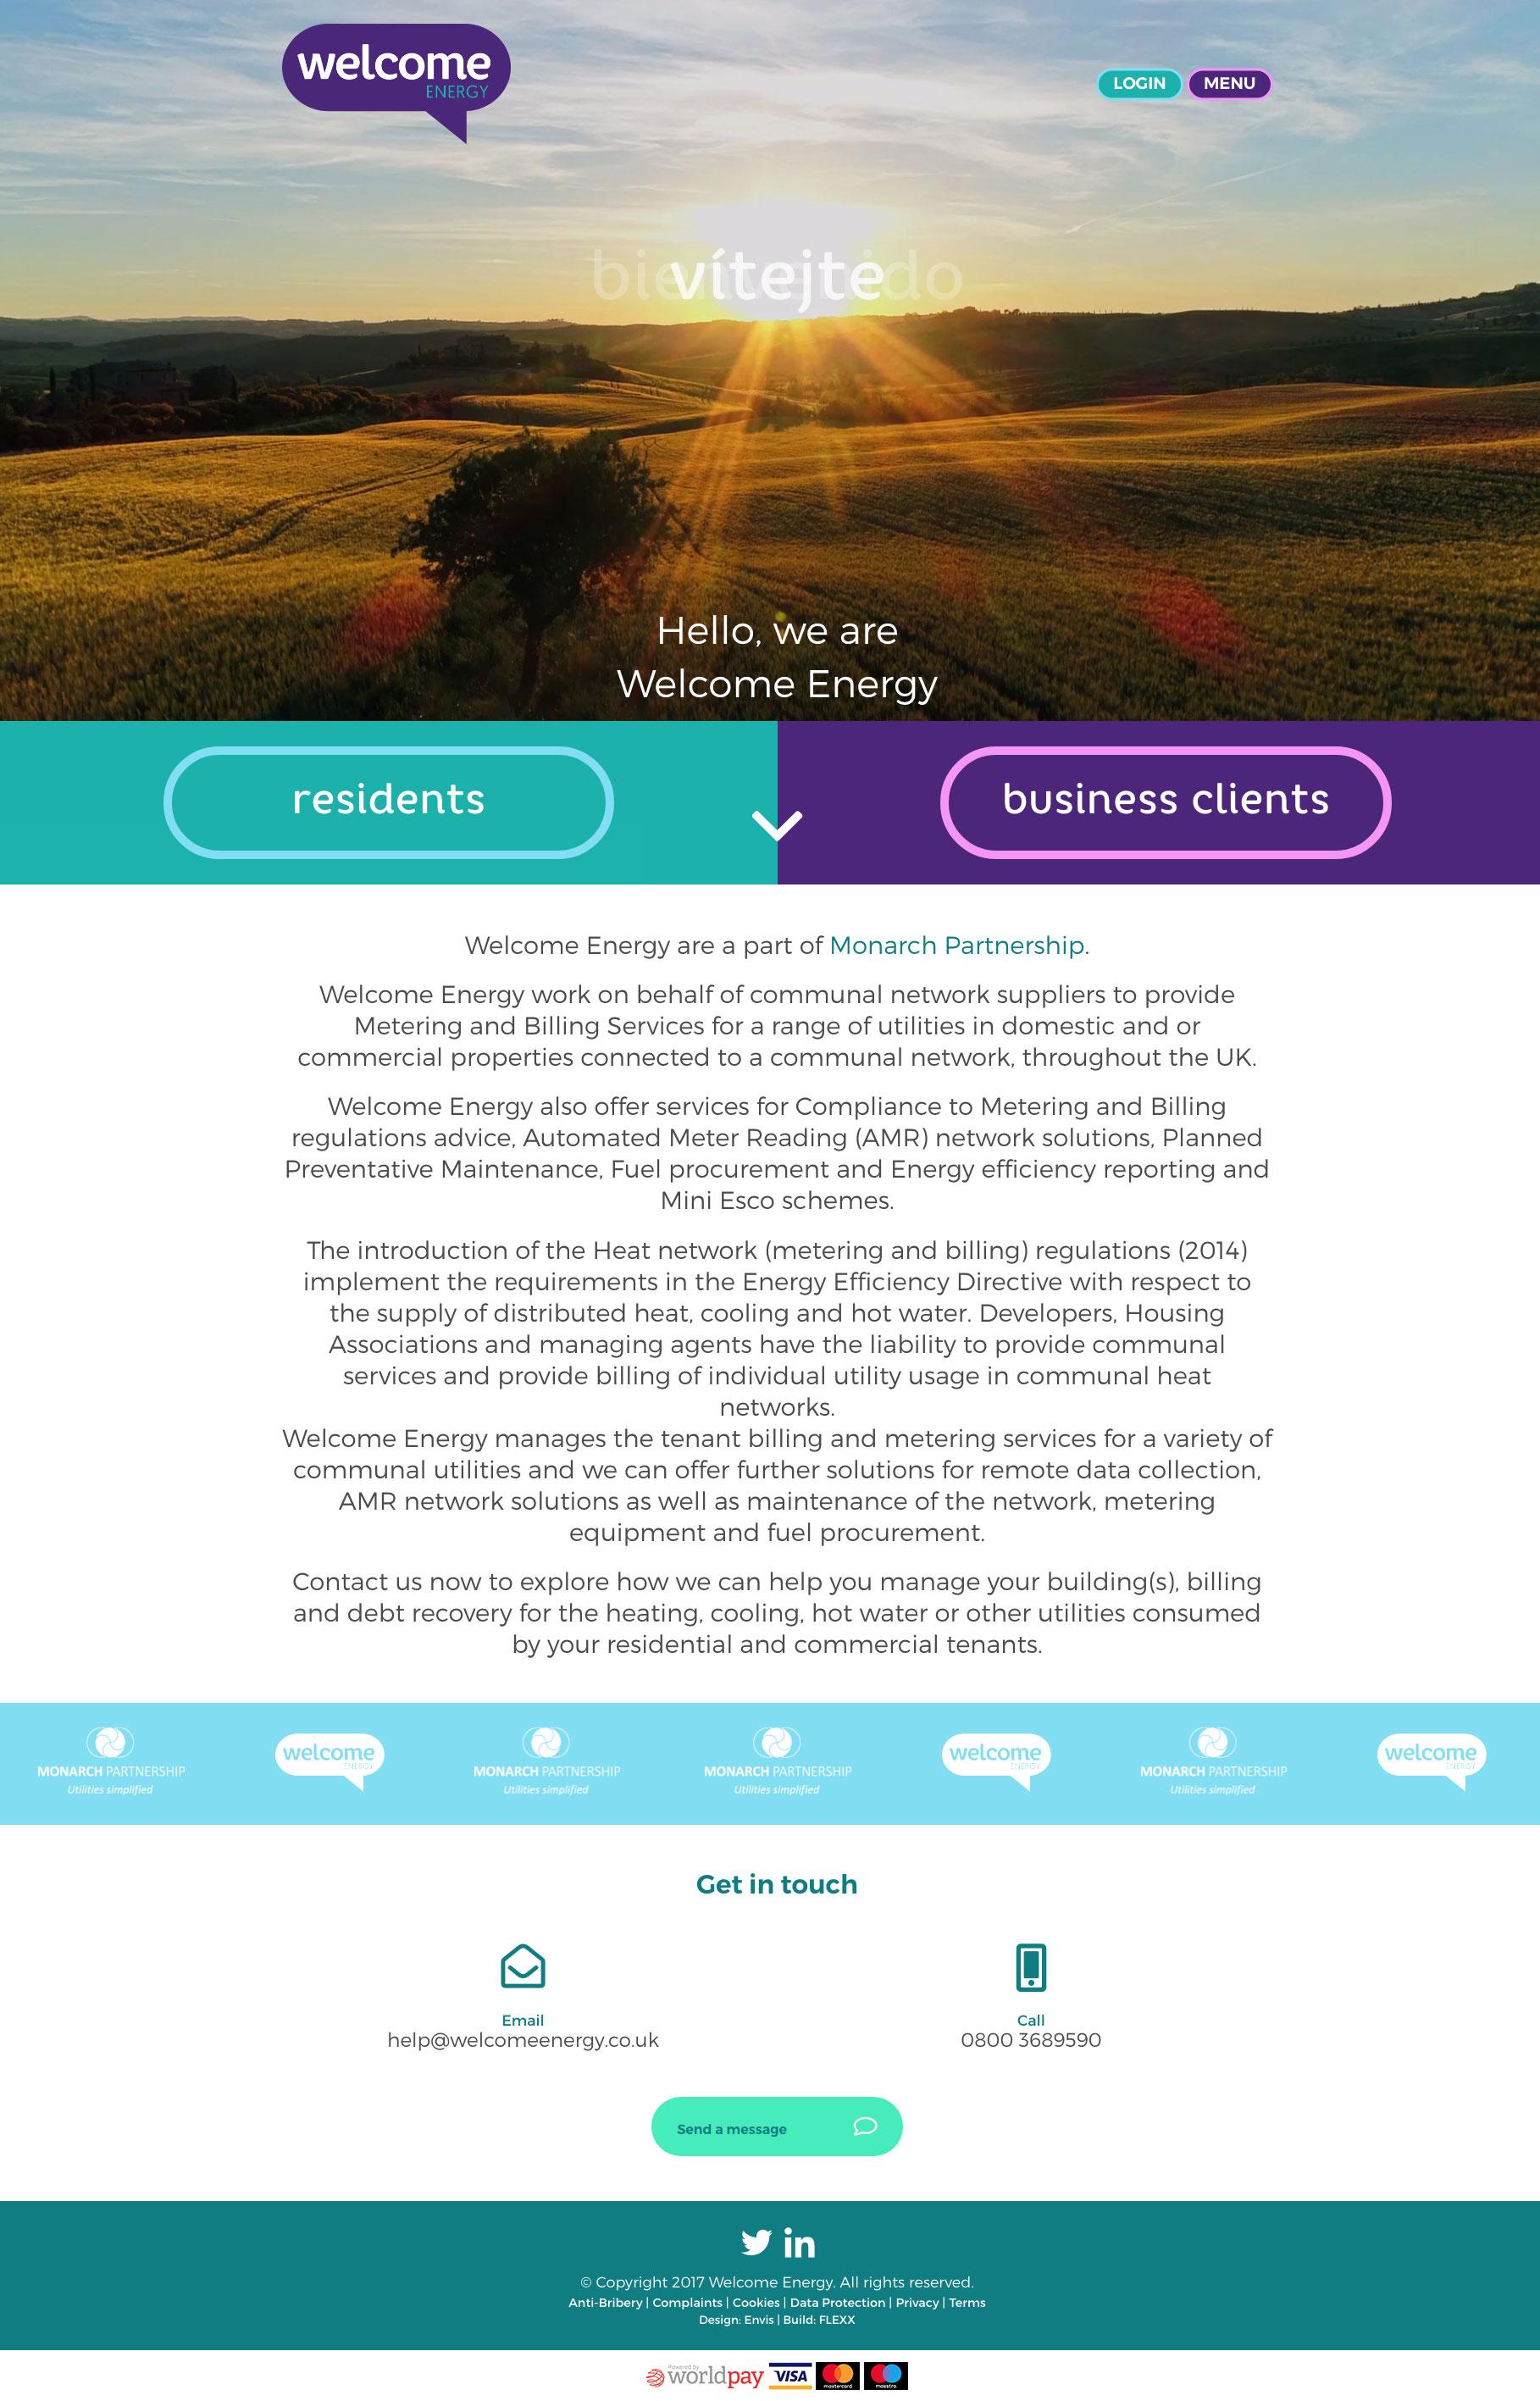 Advanced Website Design Costs